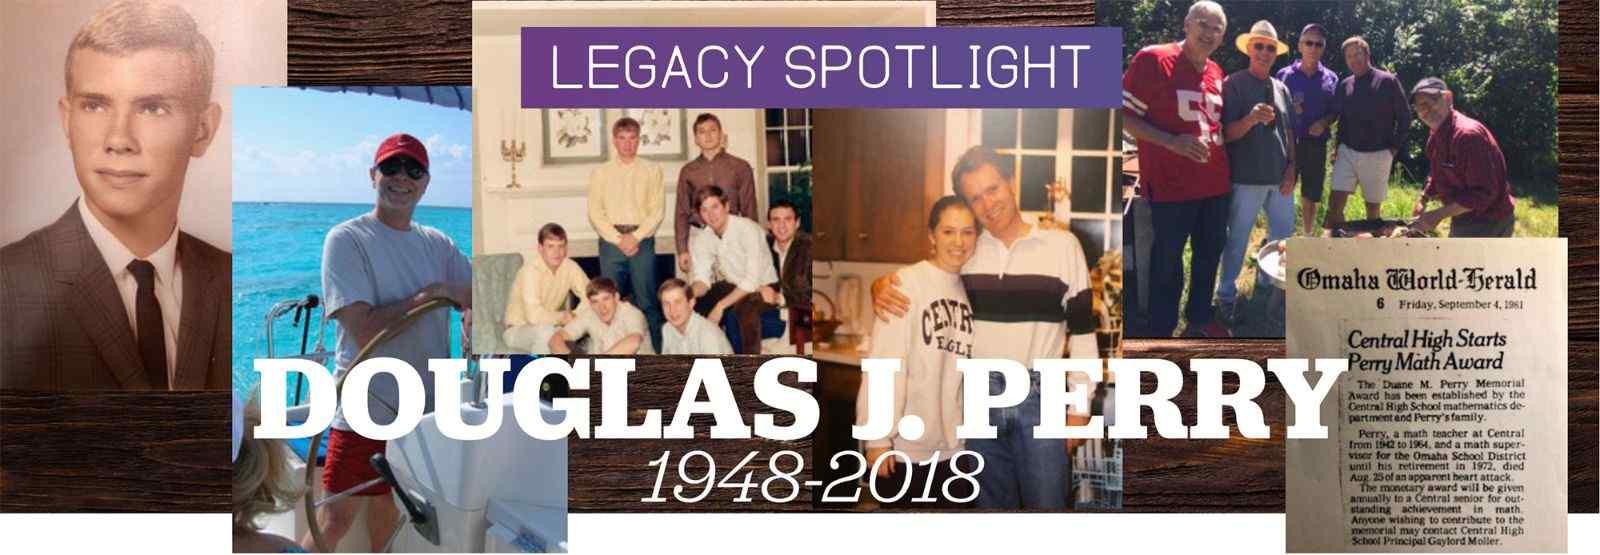 Legacy Spotlight: Douglas J. Perry, 1948-2018